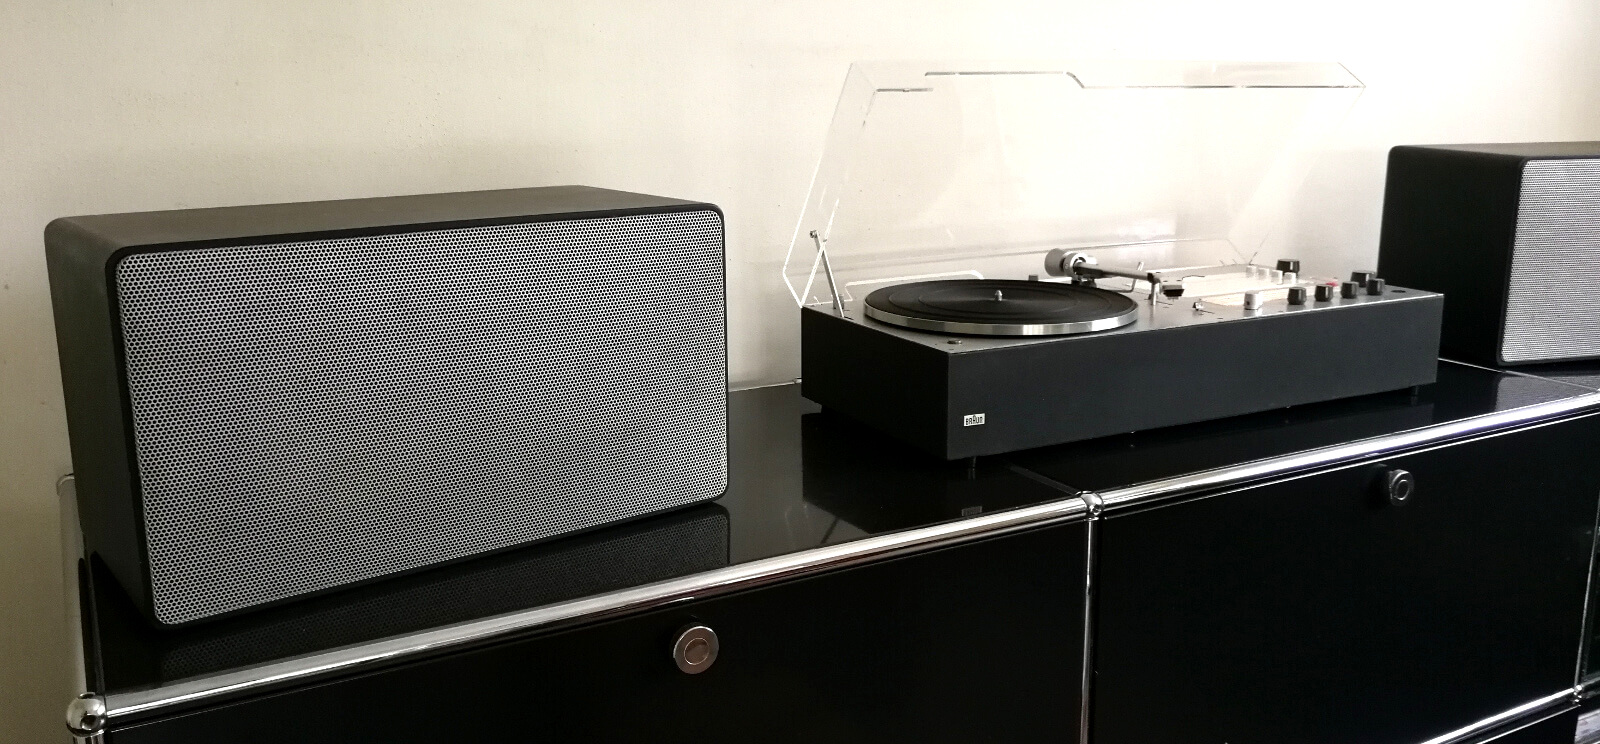 vintage braun audio 310 anthracite with L500 speakers black